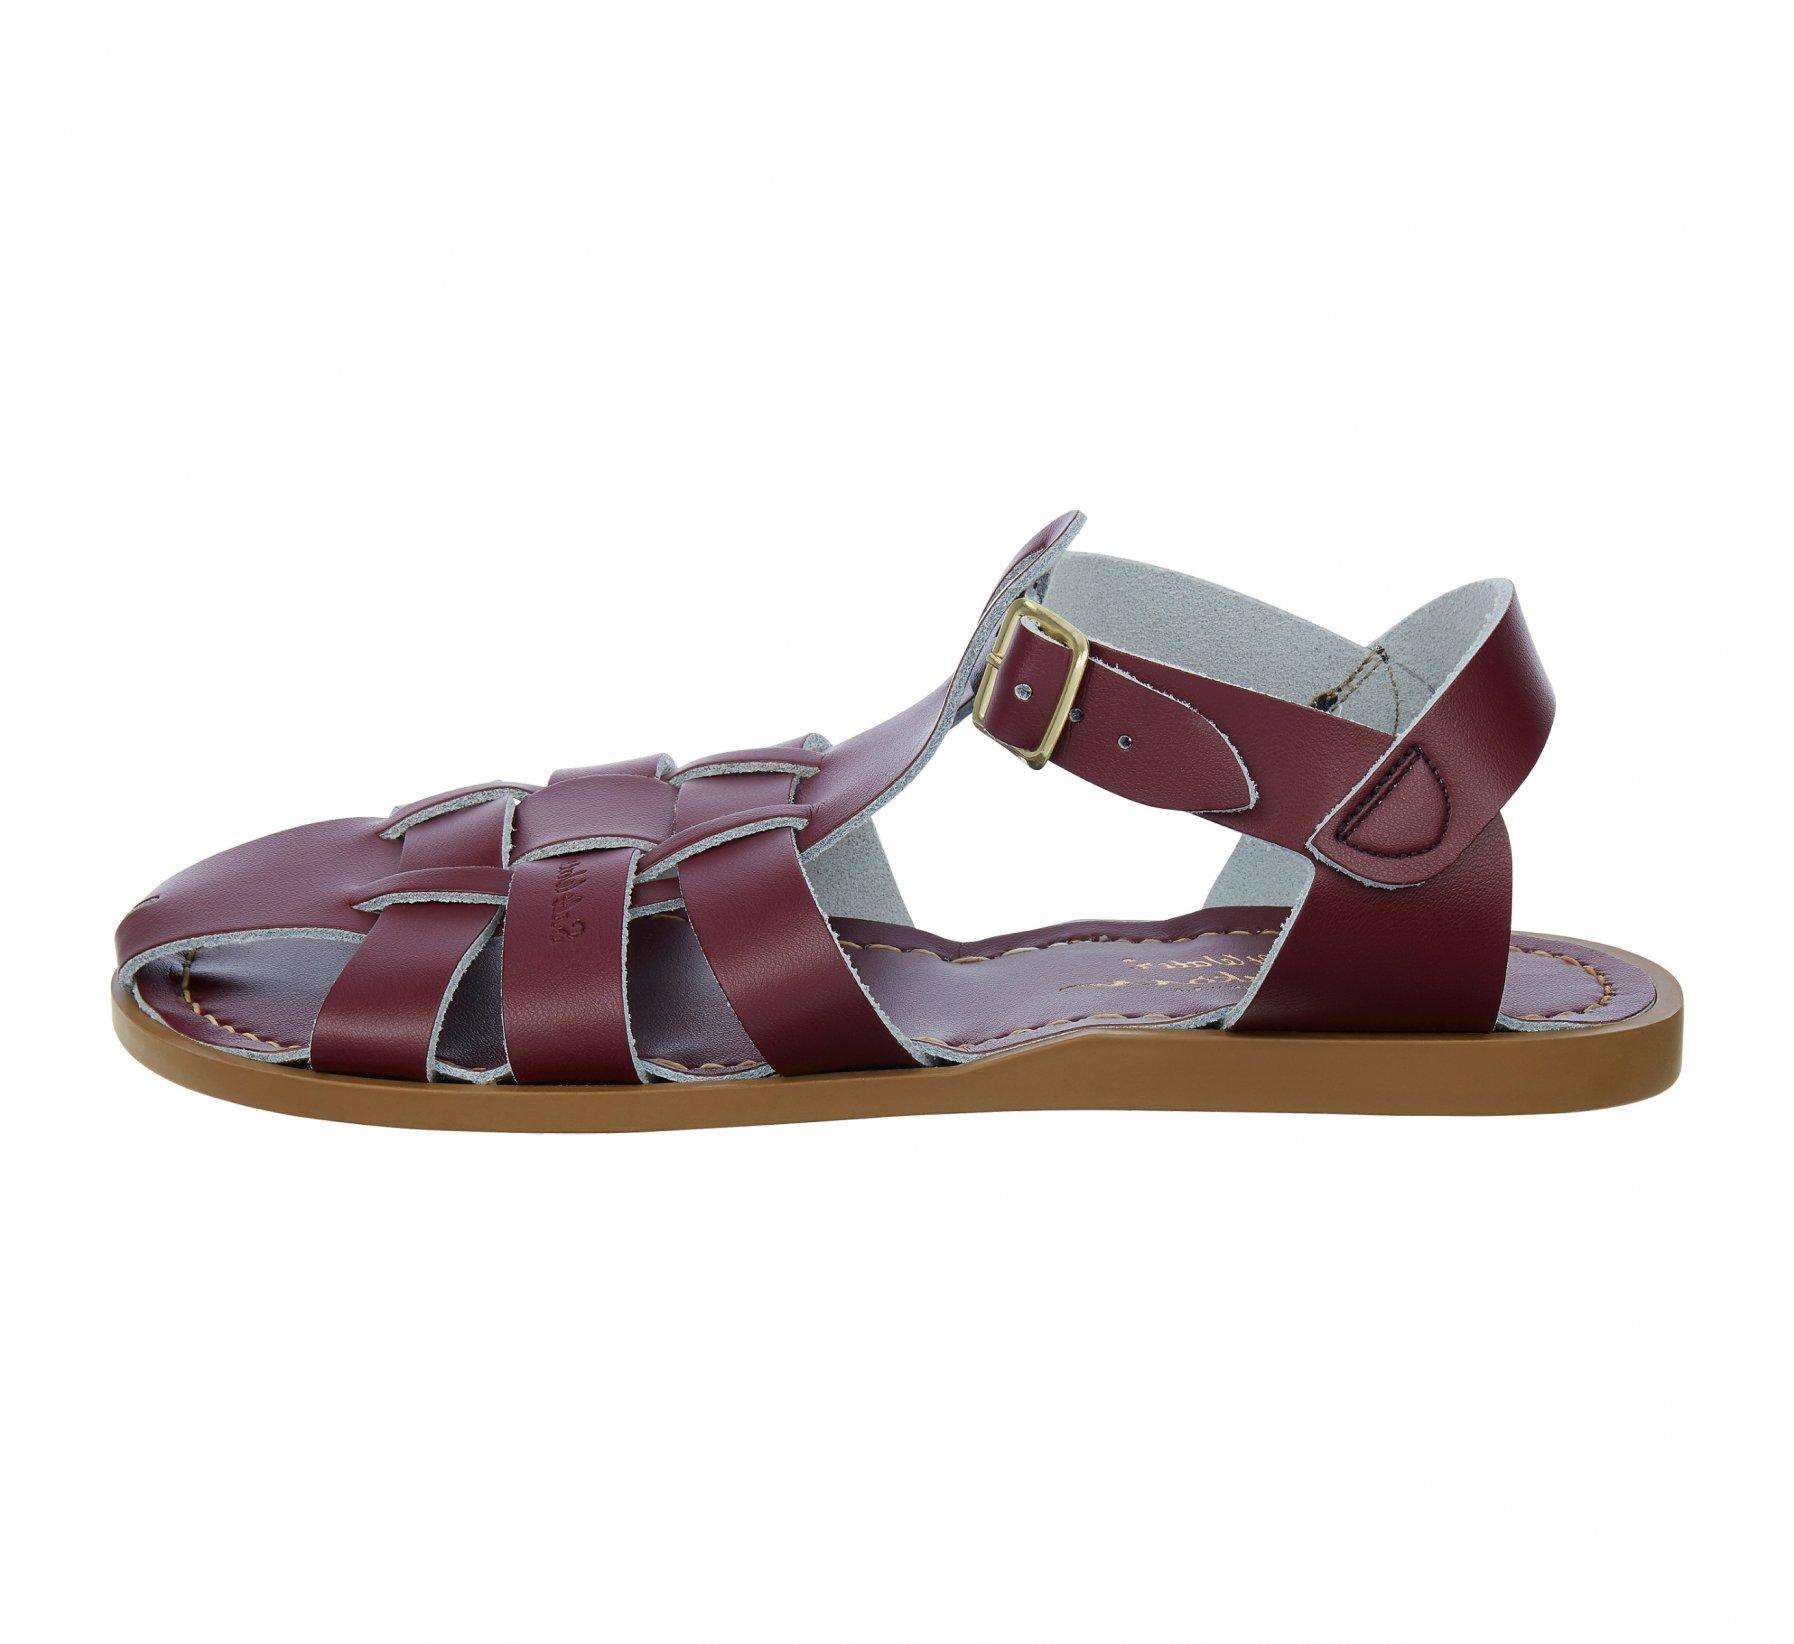 Shark Original Claret  - Salt Water Sandals